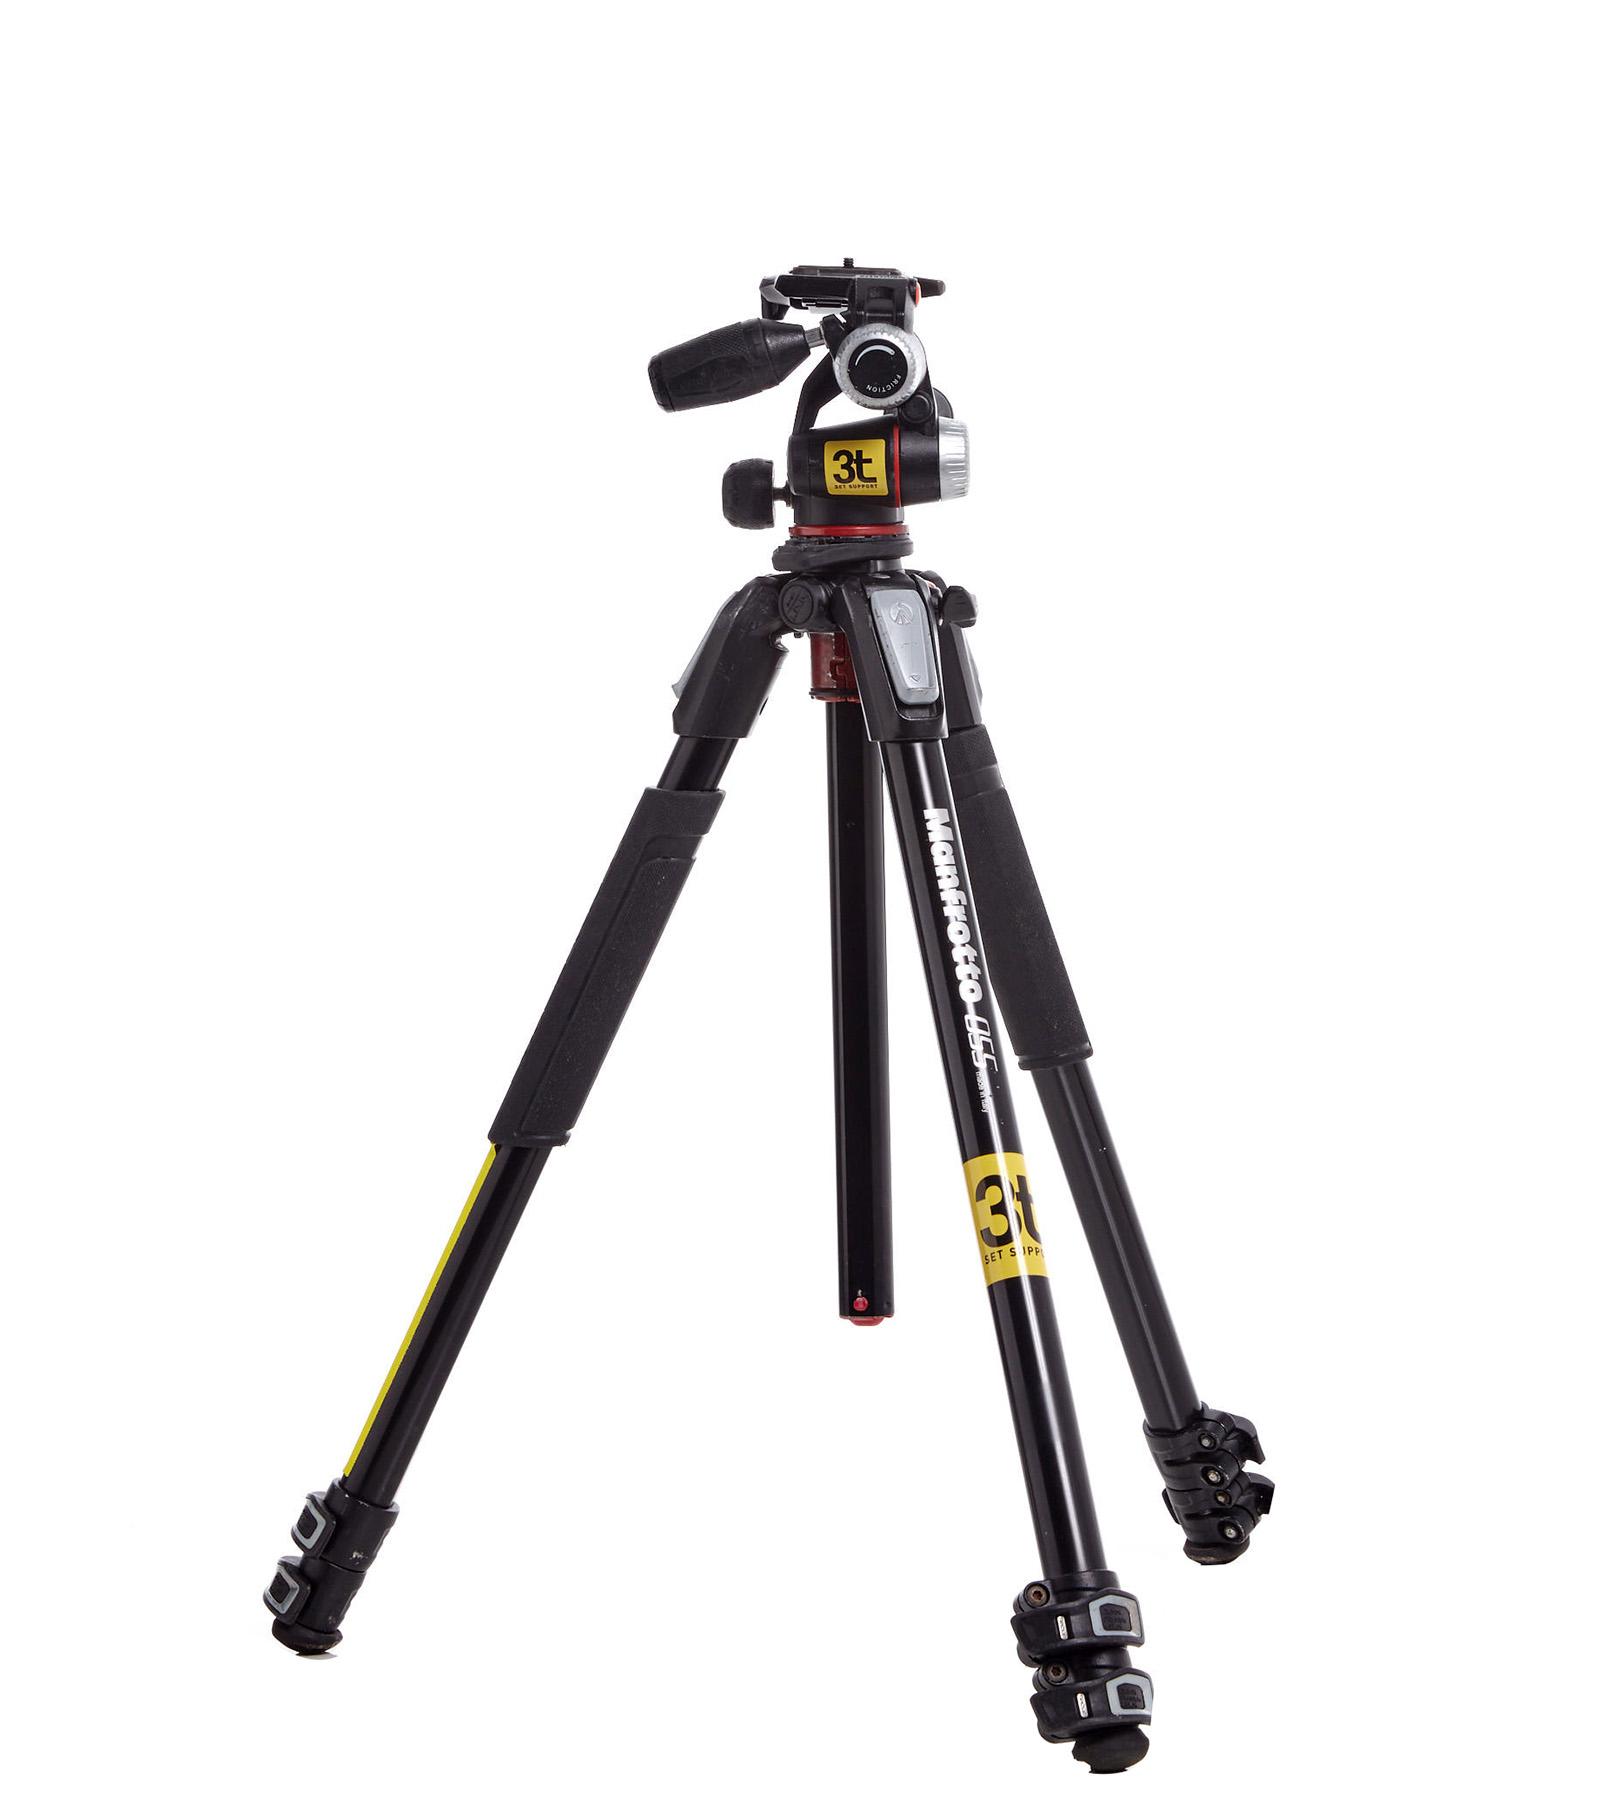 Tripé de câmera Manfrotto 055XPRO3 com cabeça XPRO 3-way